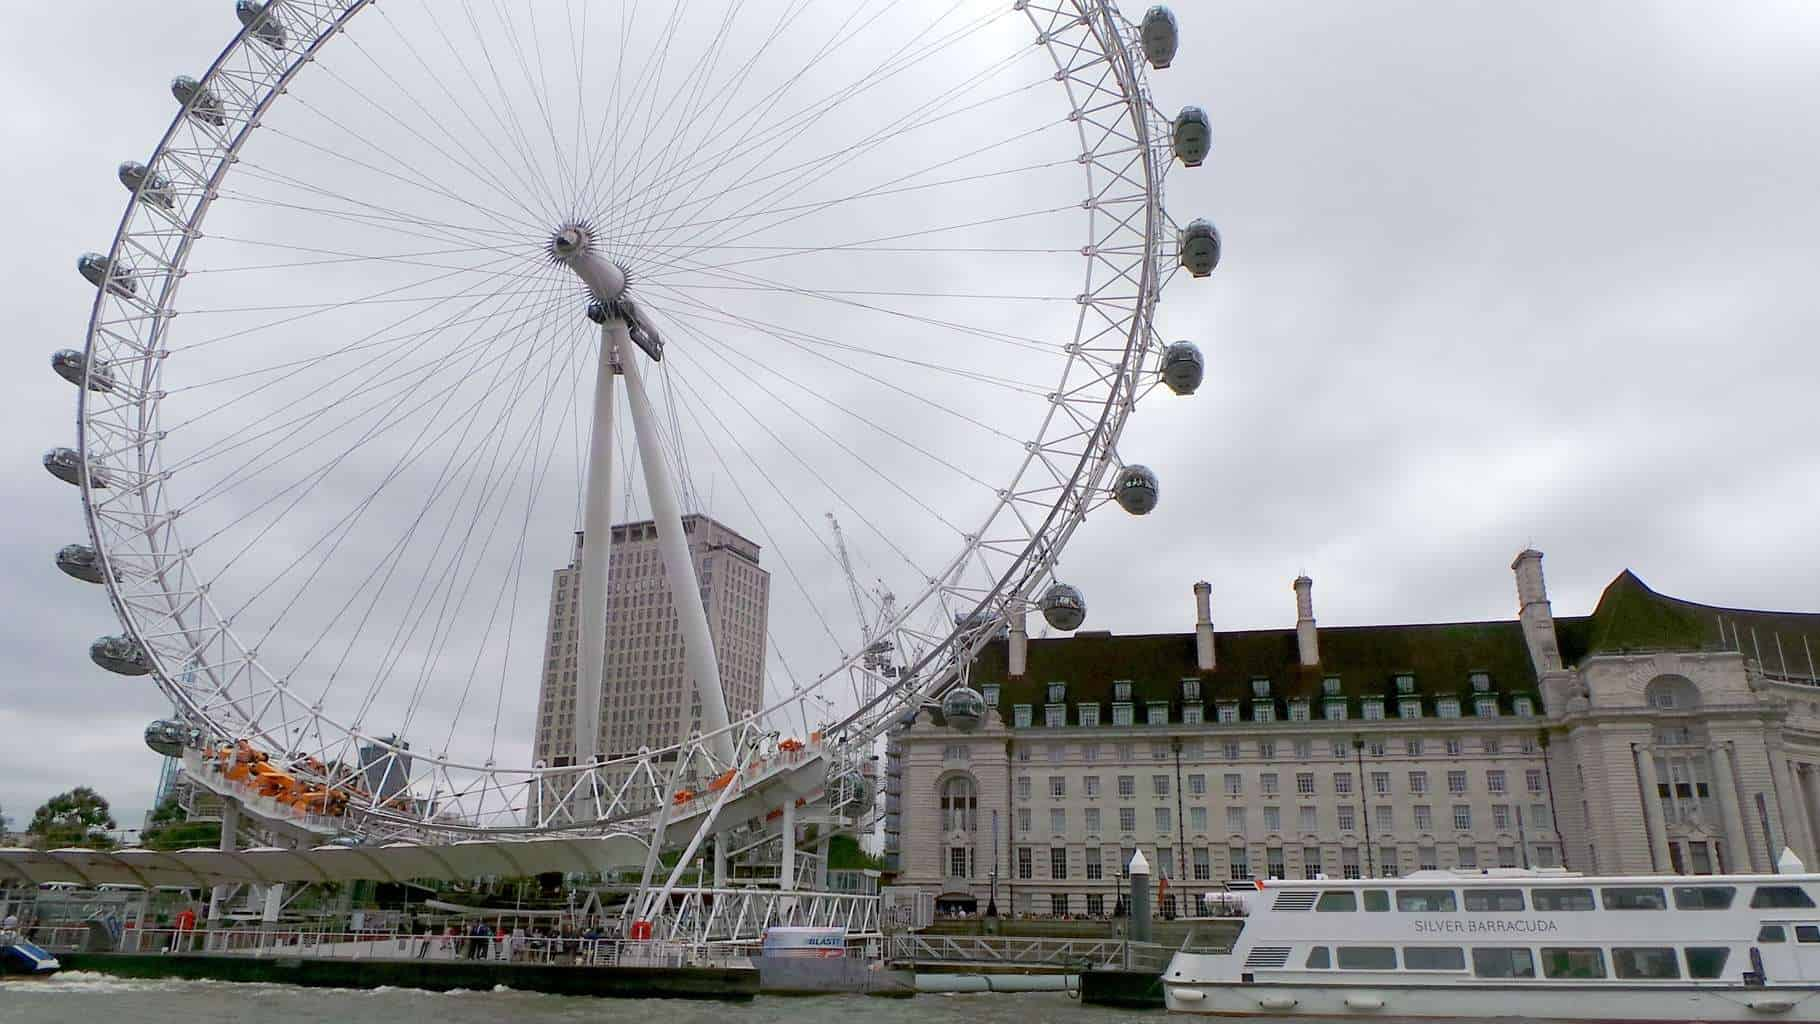 City Cruises - London Eye